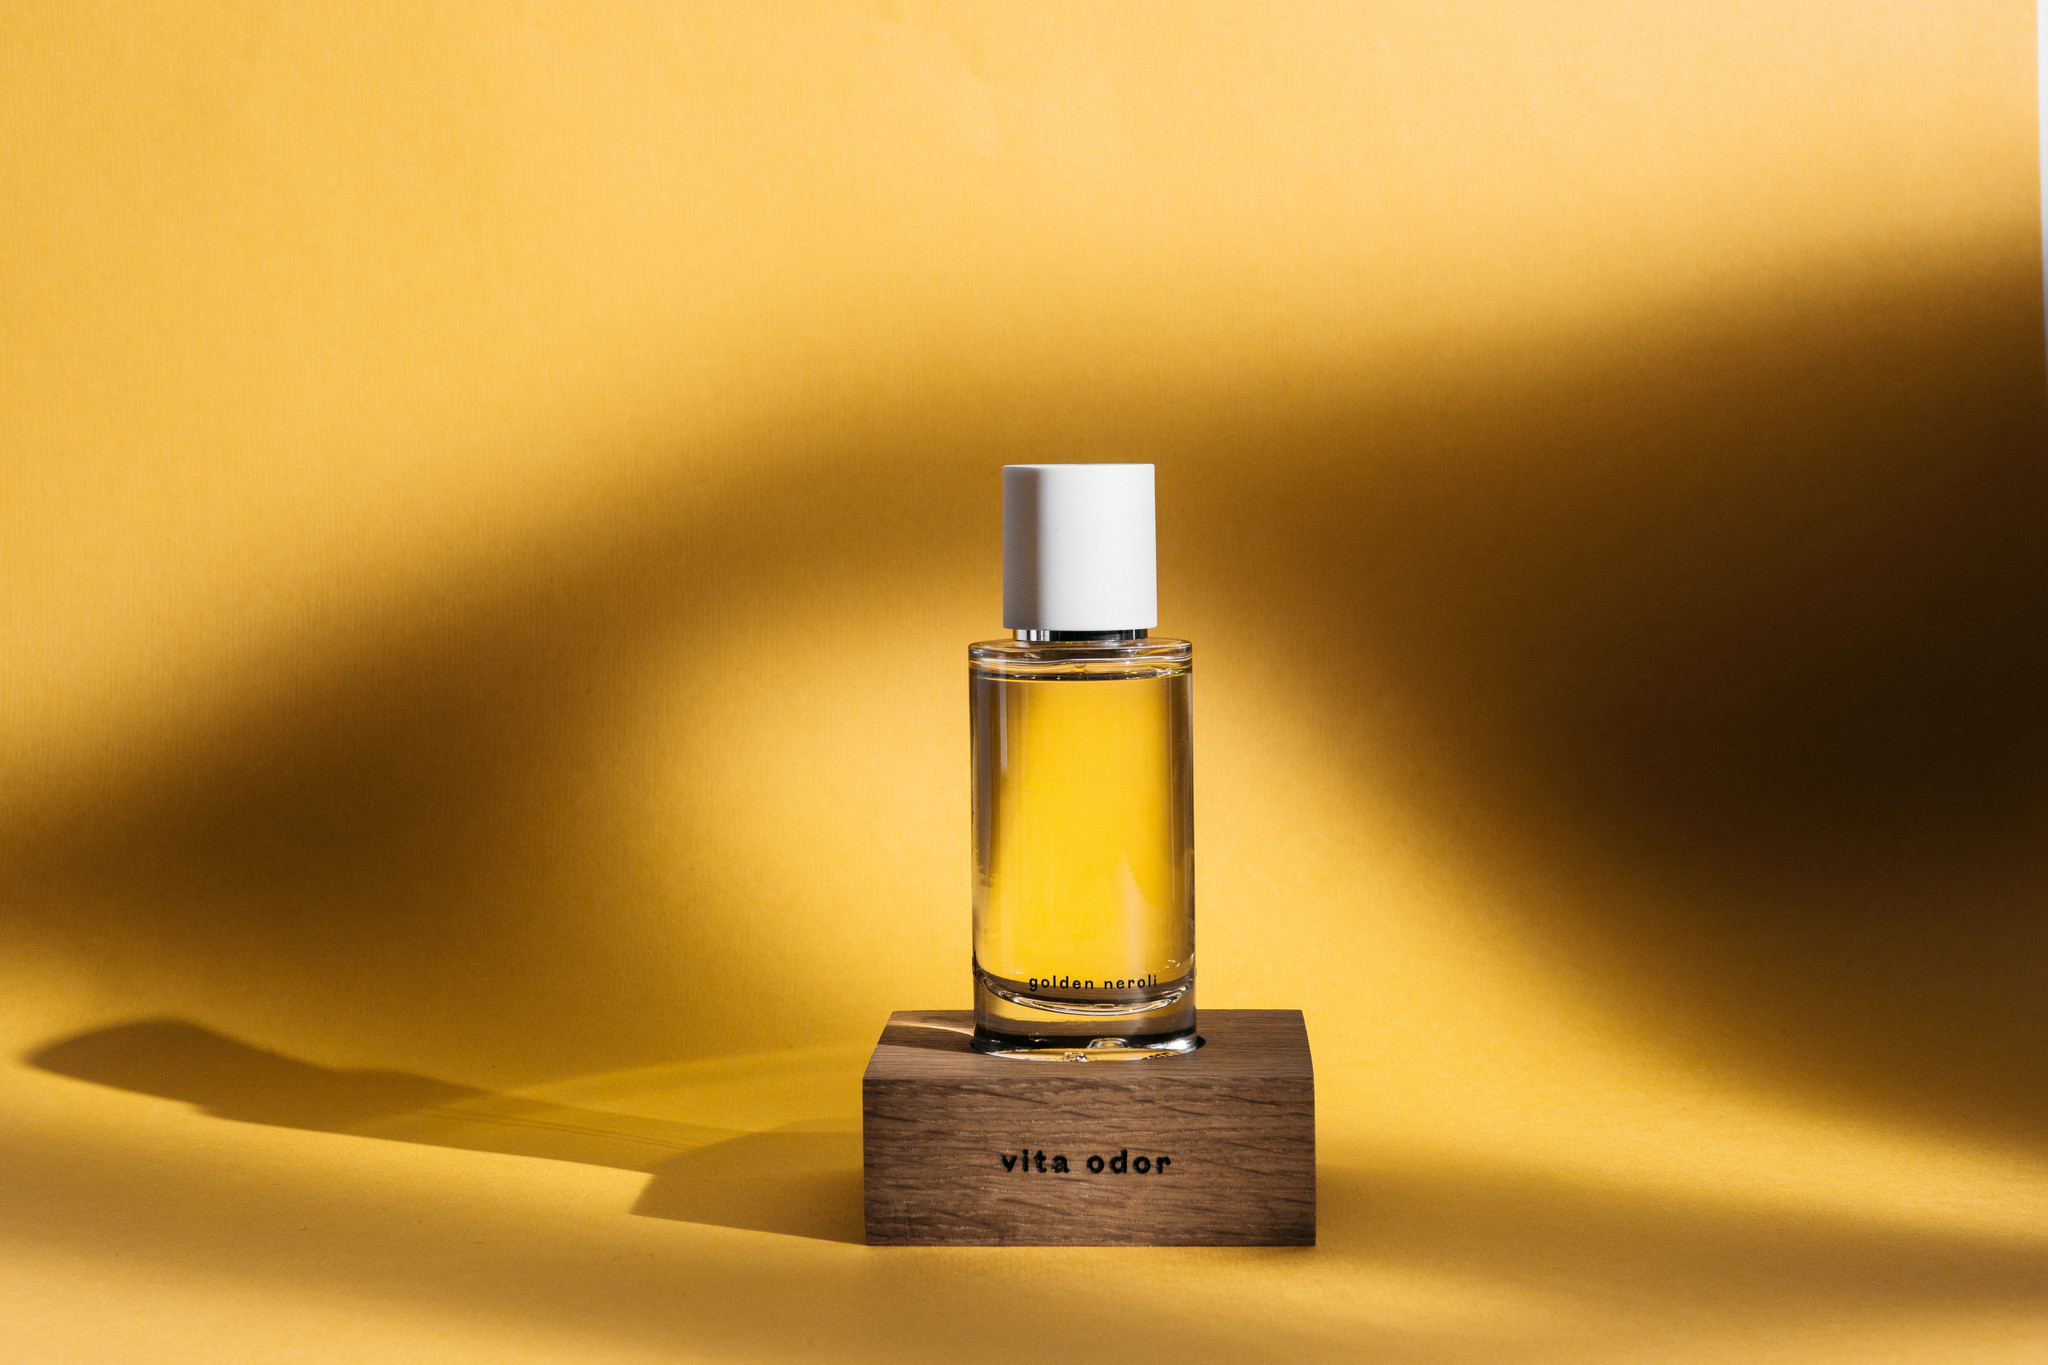 Golden Neroni-8